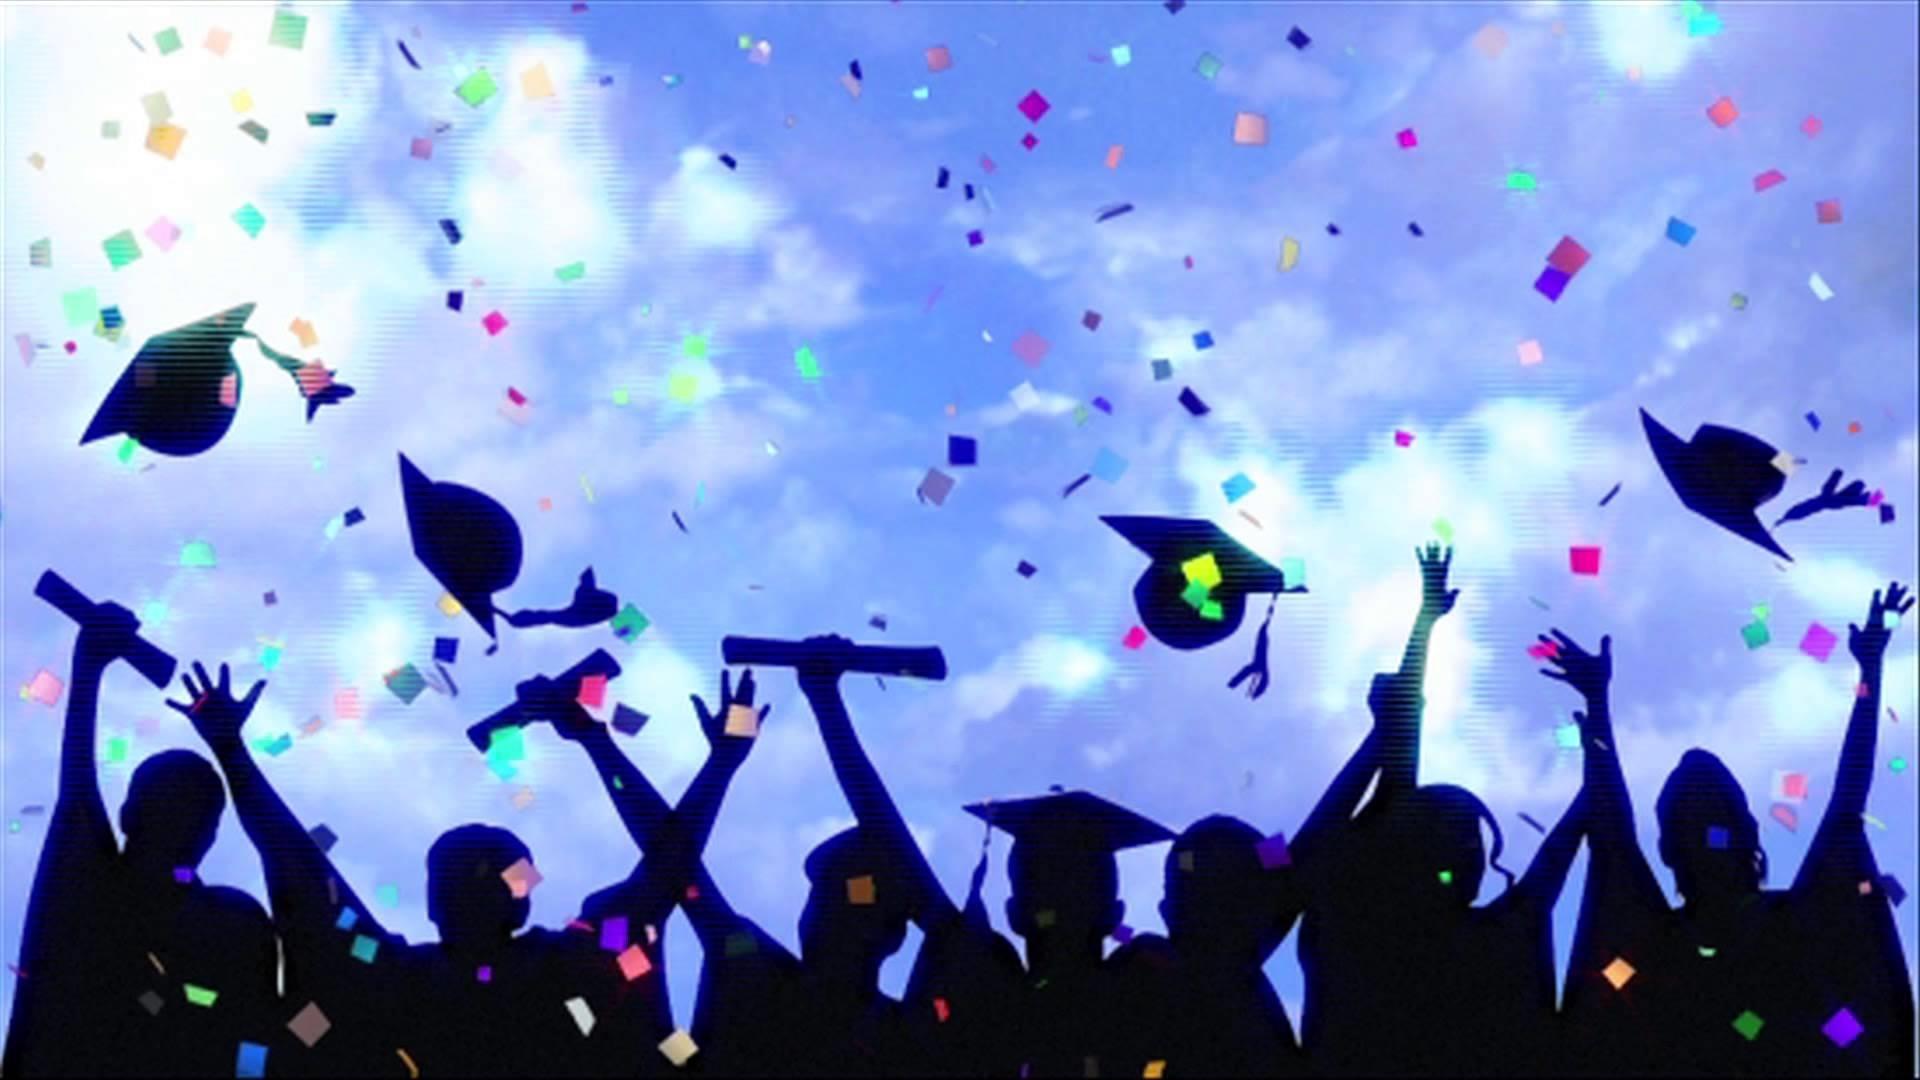 Graduation Wallpaper for pc